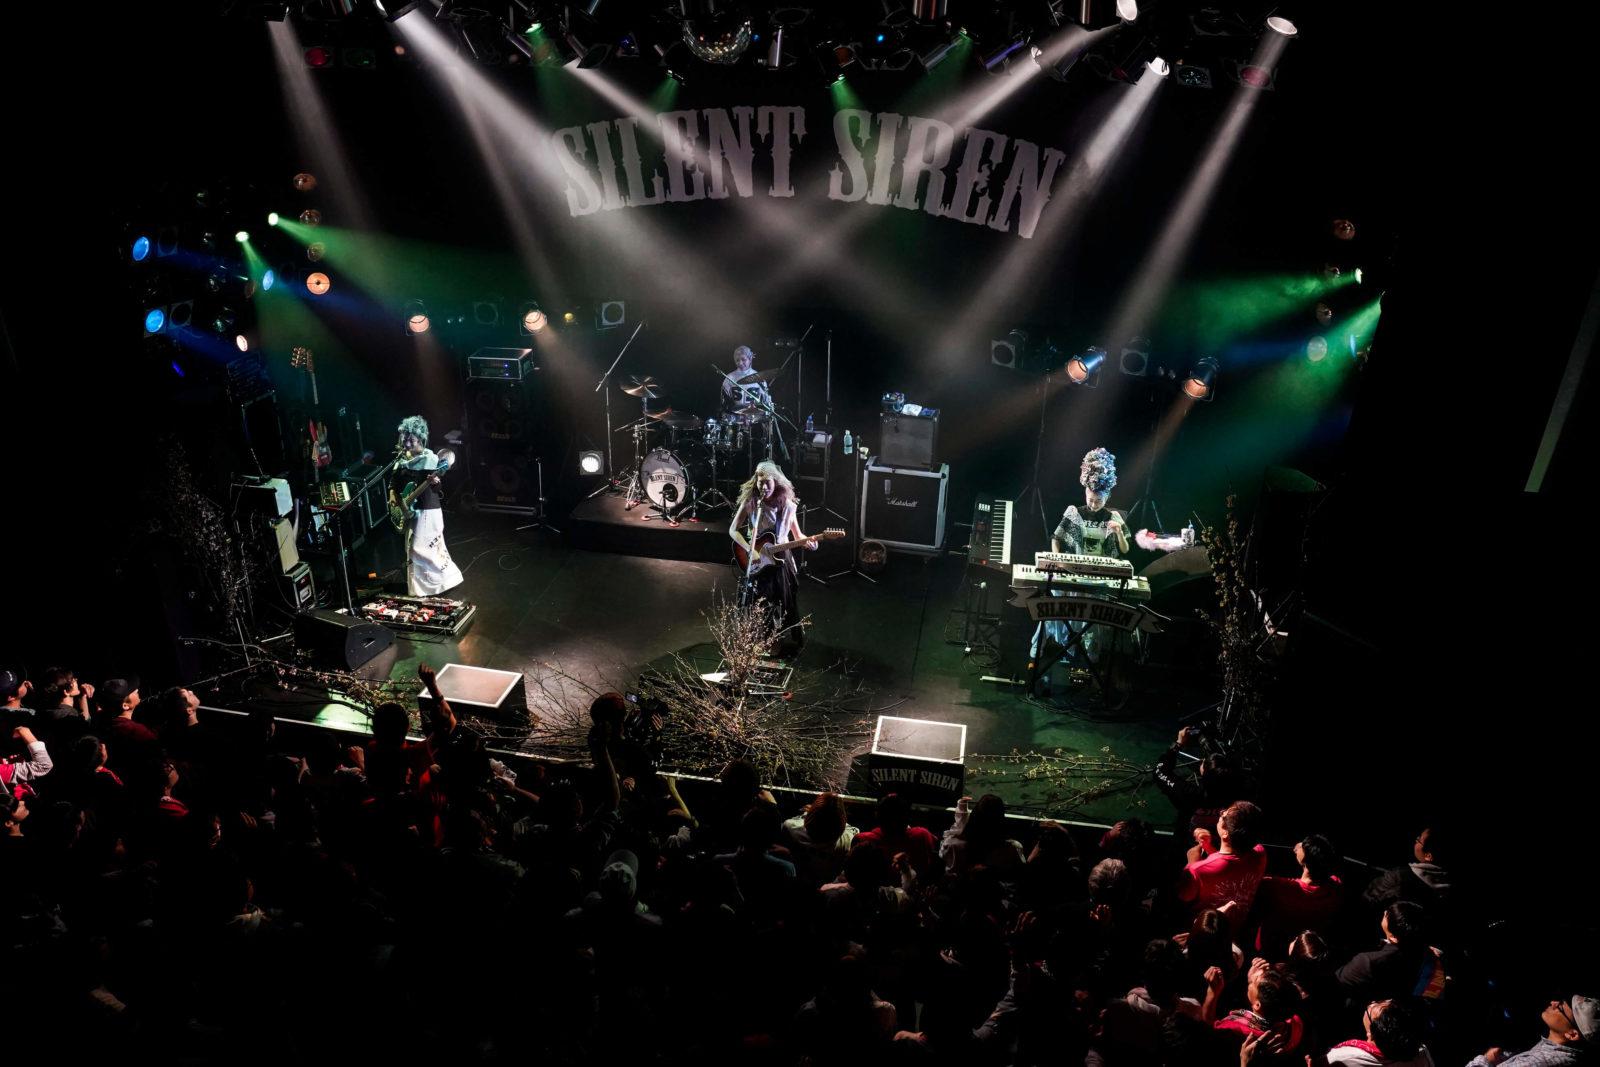 SILENT SIRENが6thアルバム「31313」リリースを記念して突如渋谷でシークレットライブを開催サムネイル画像